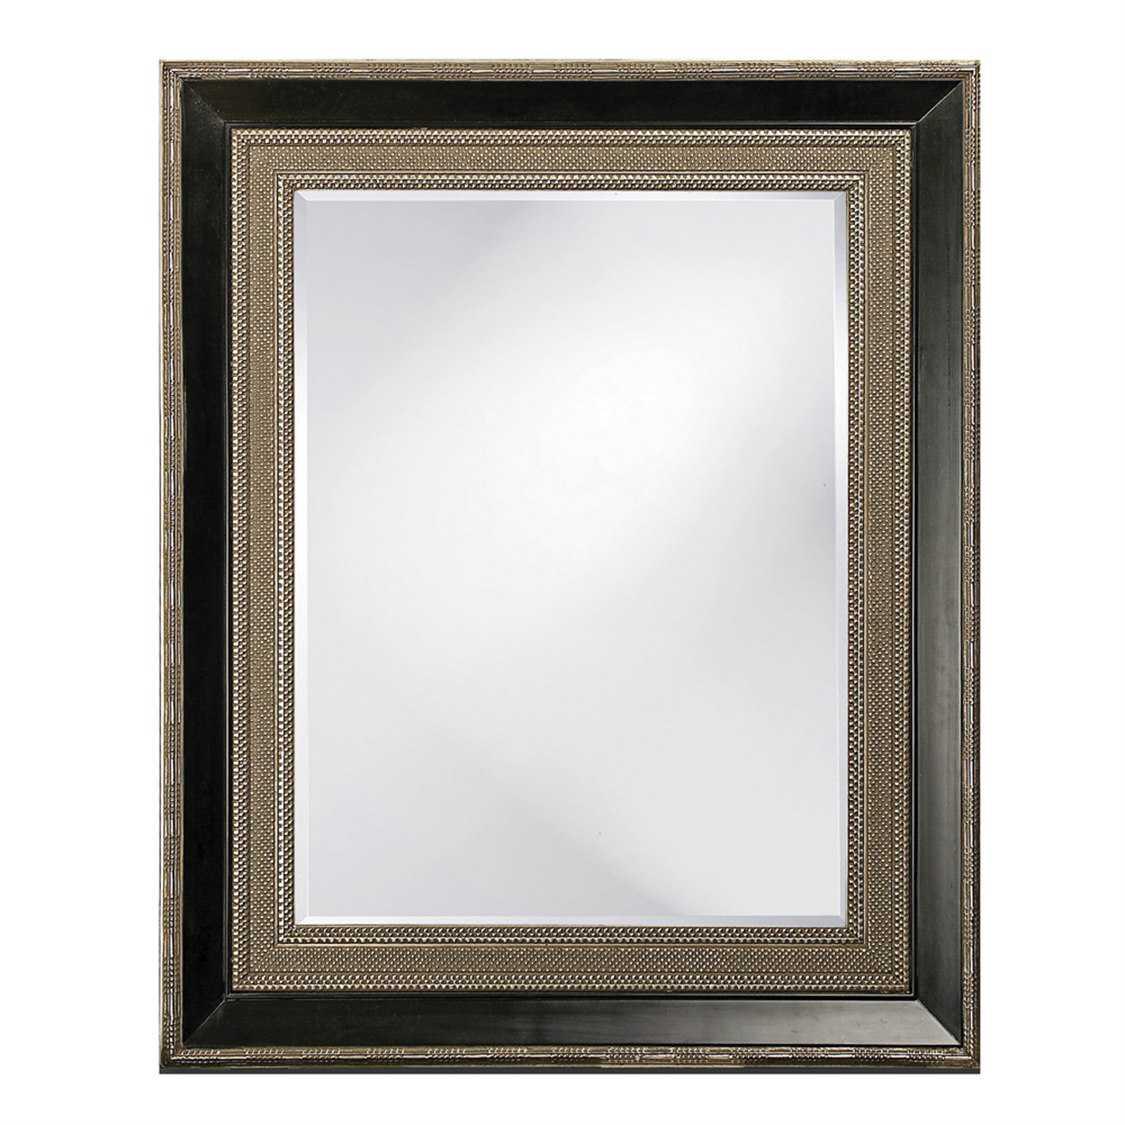 Howard elliott arnaud 43 x 53 small rectangle wall mirror for Small wall mirrors